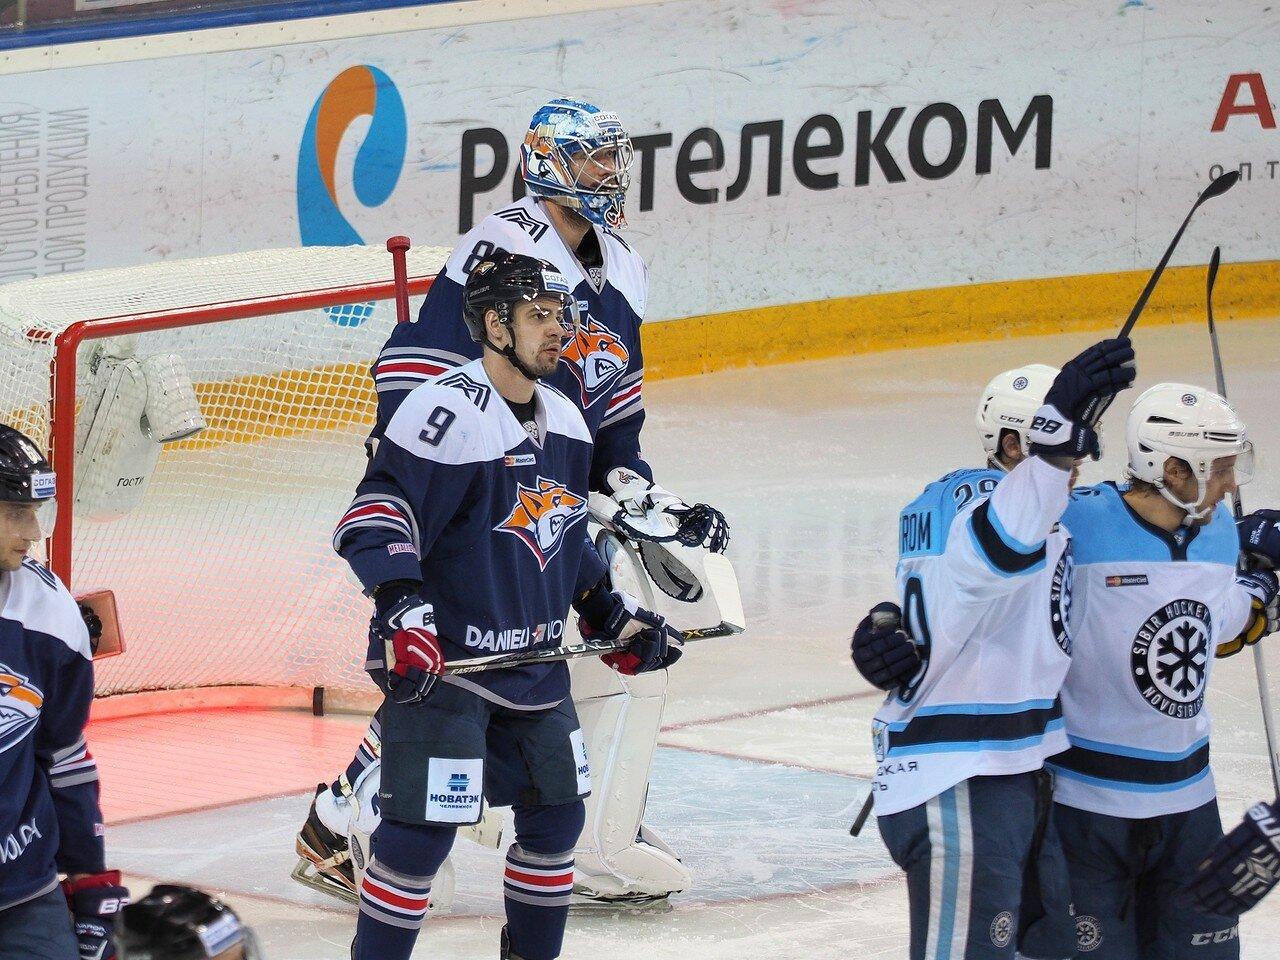 79Плей-офф 2016 Восток 1/2 Металлург - Сибирь 10.03.2016